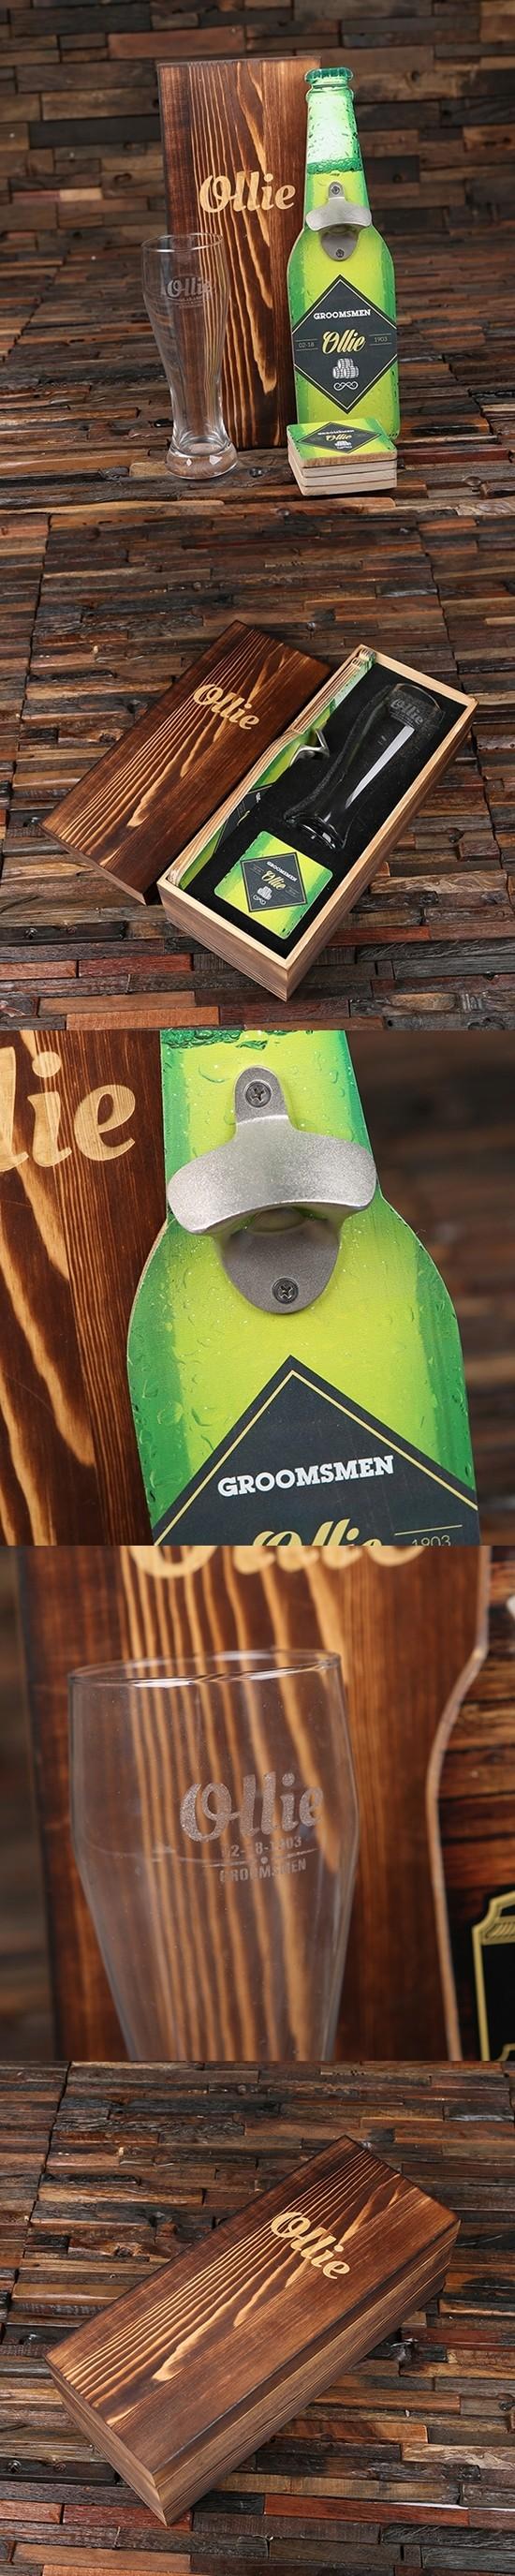 Diamond Label Wall Hang Bottle Opener, 4 Wood Coasters & Pilsner Glass